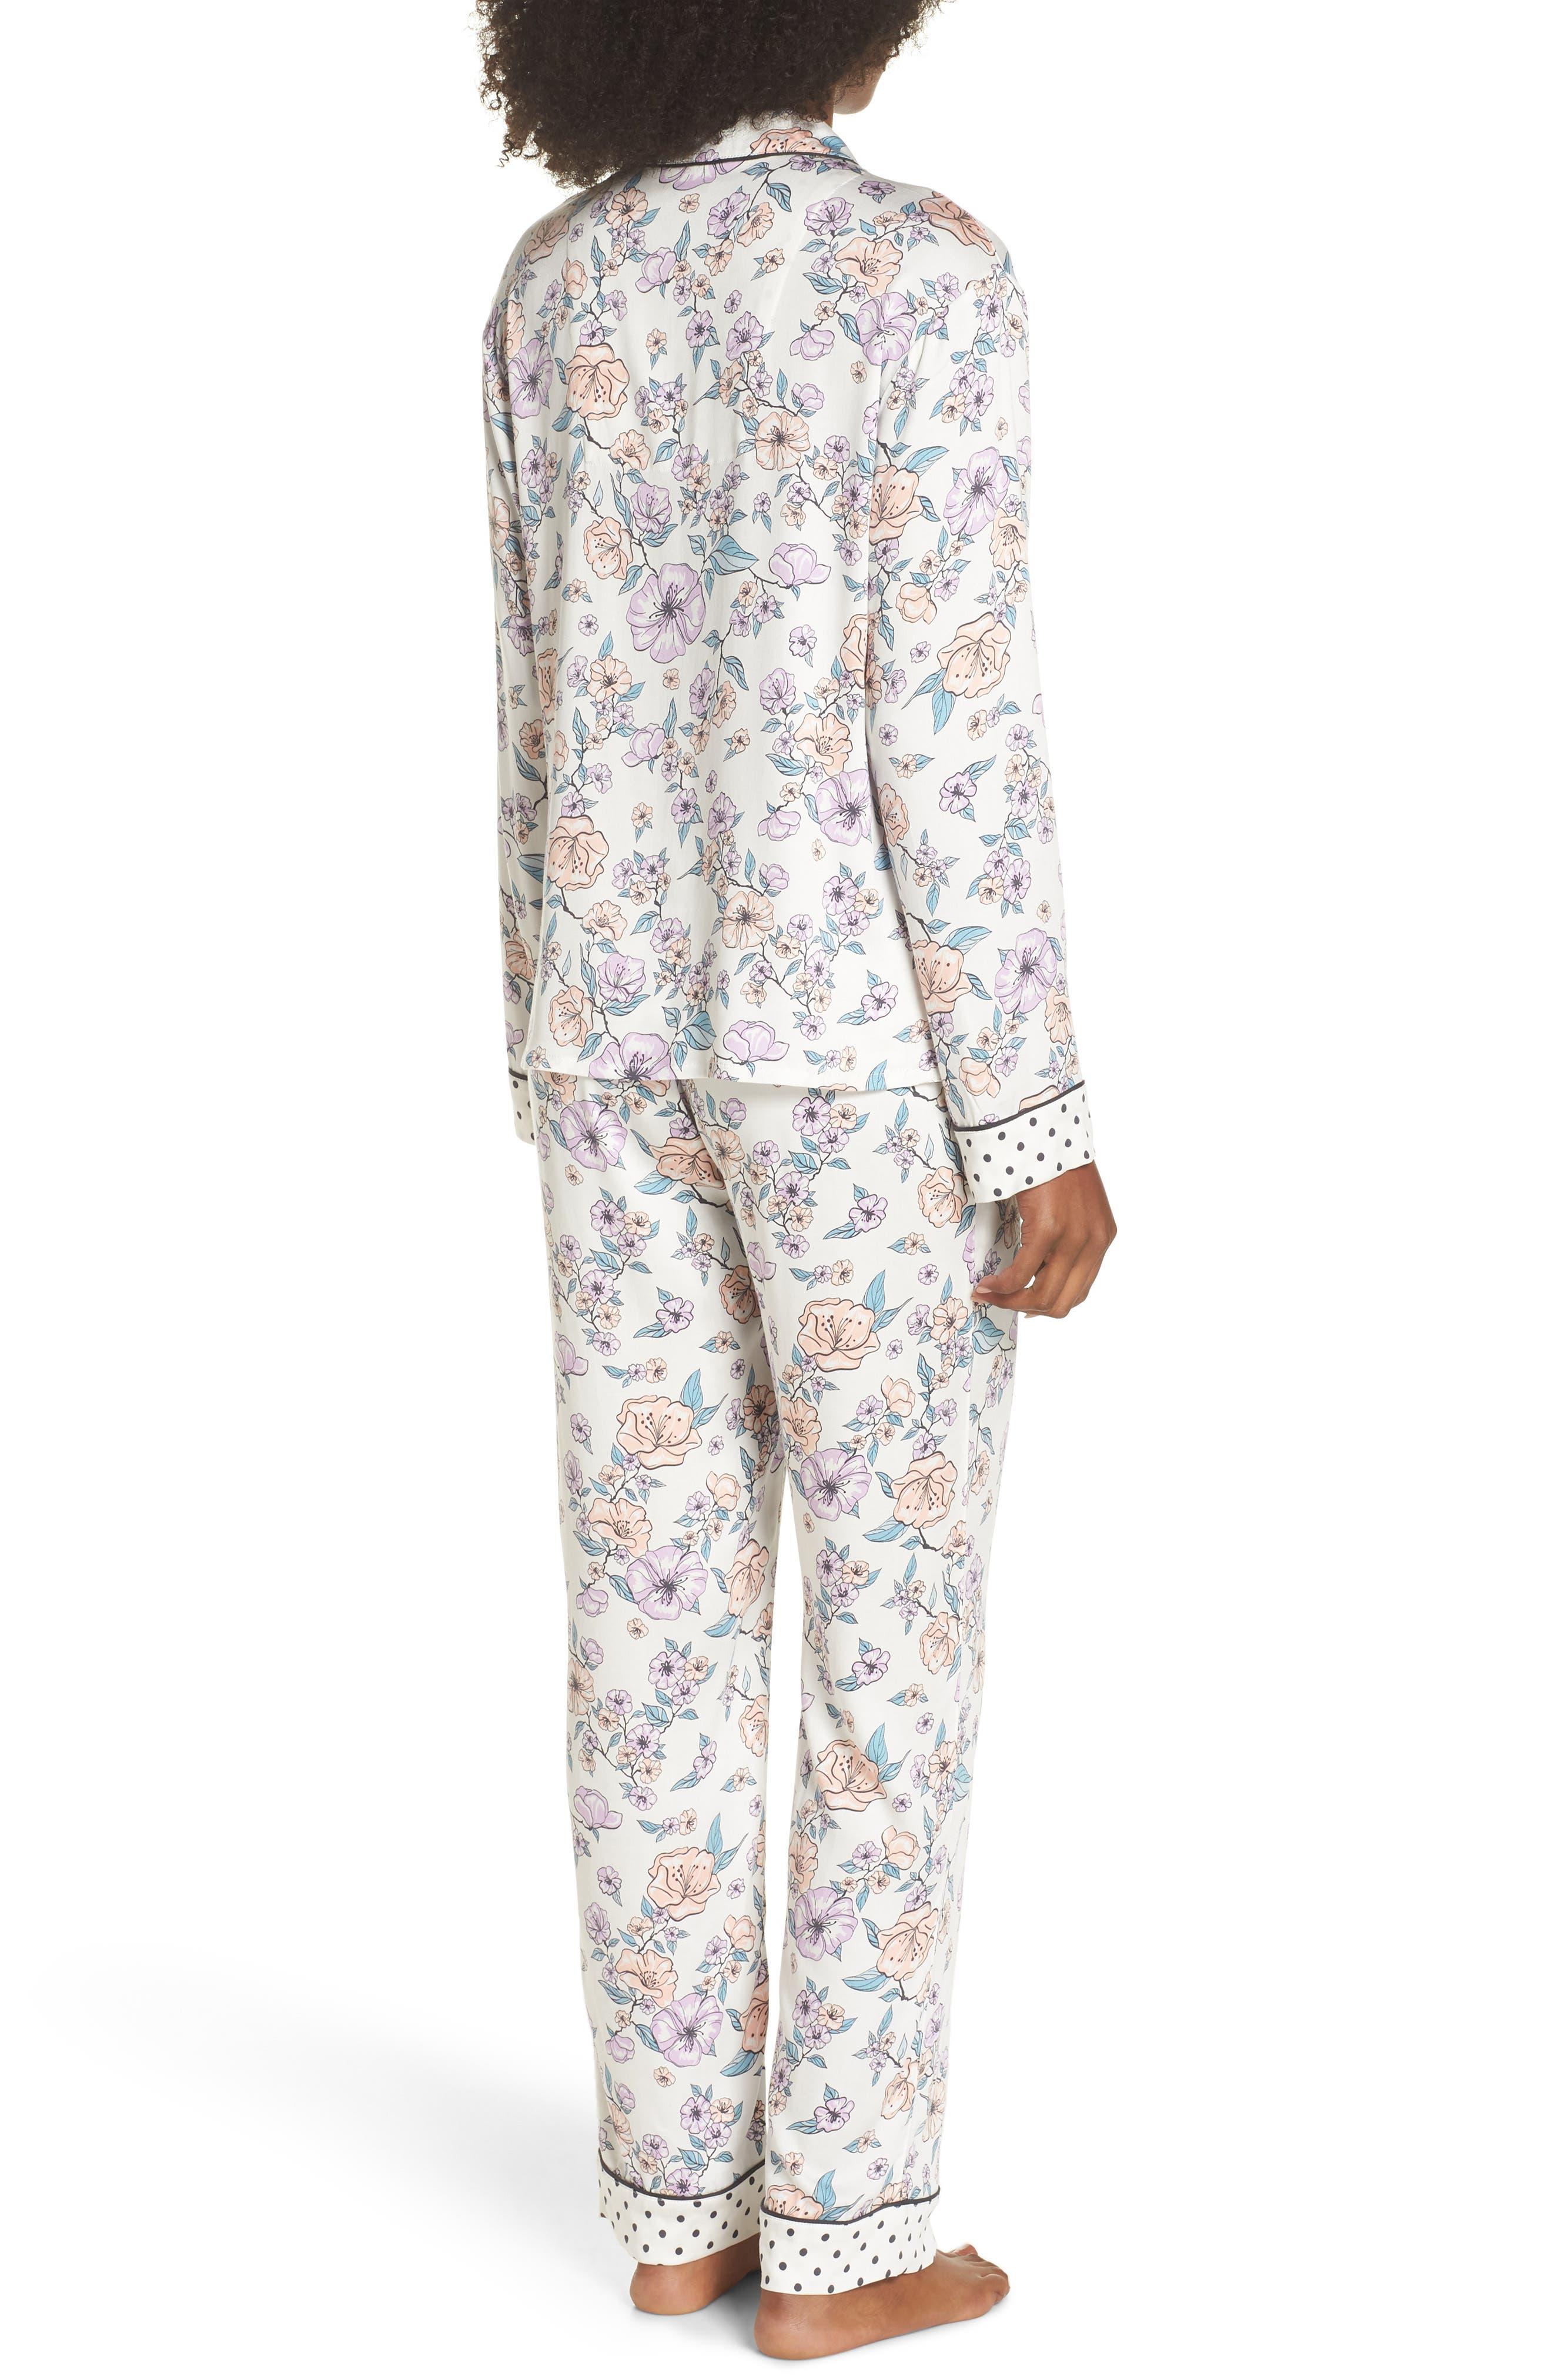 Floral Print Pajamas,                             Alternate thumbnail 2, color,                             Natural